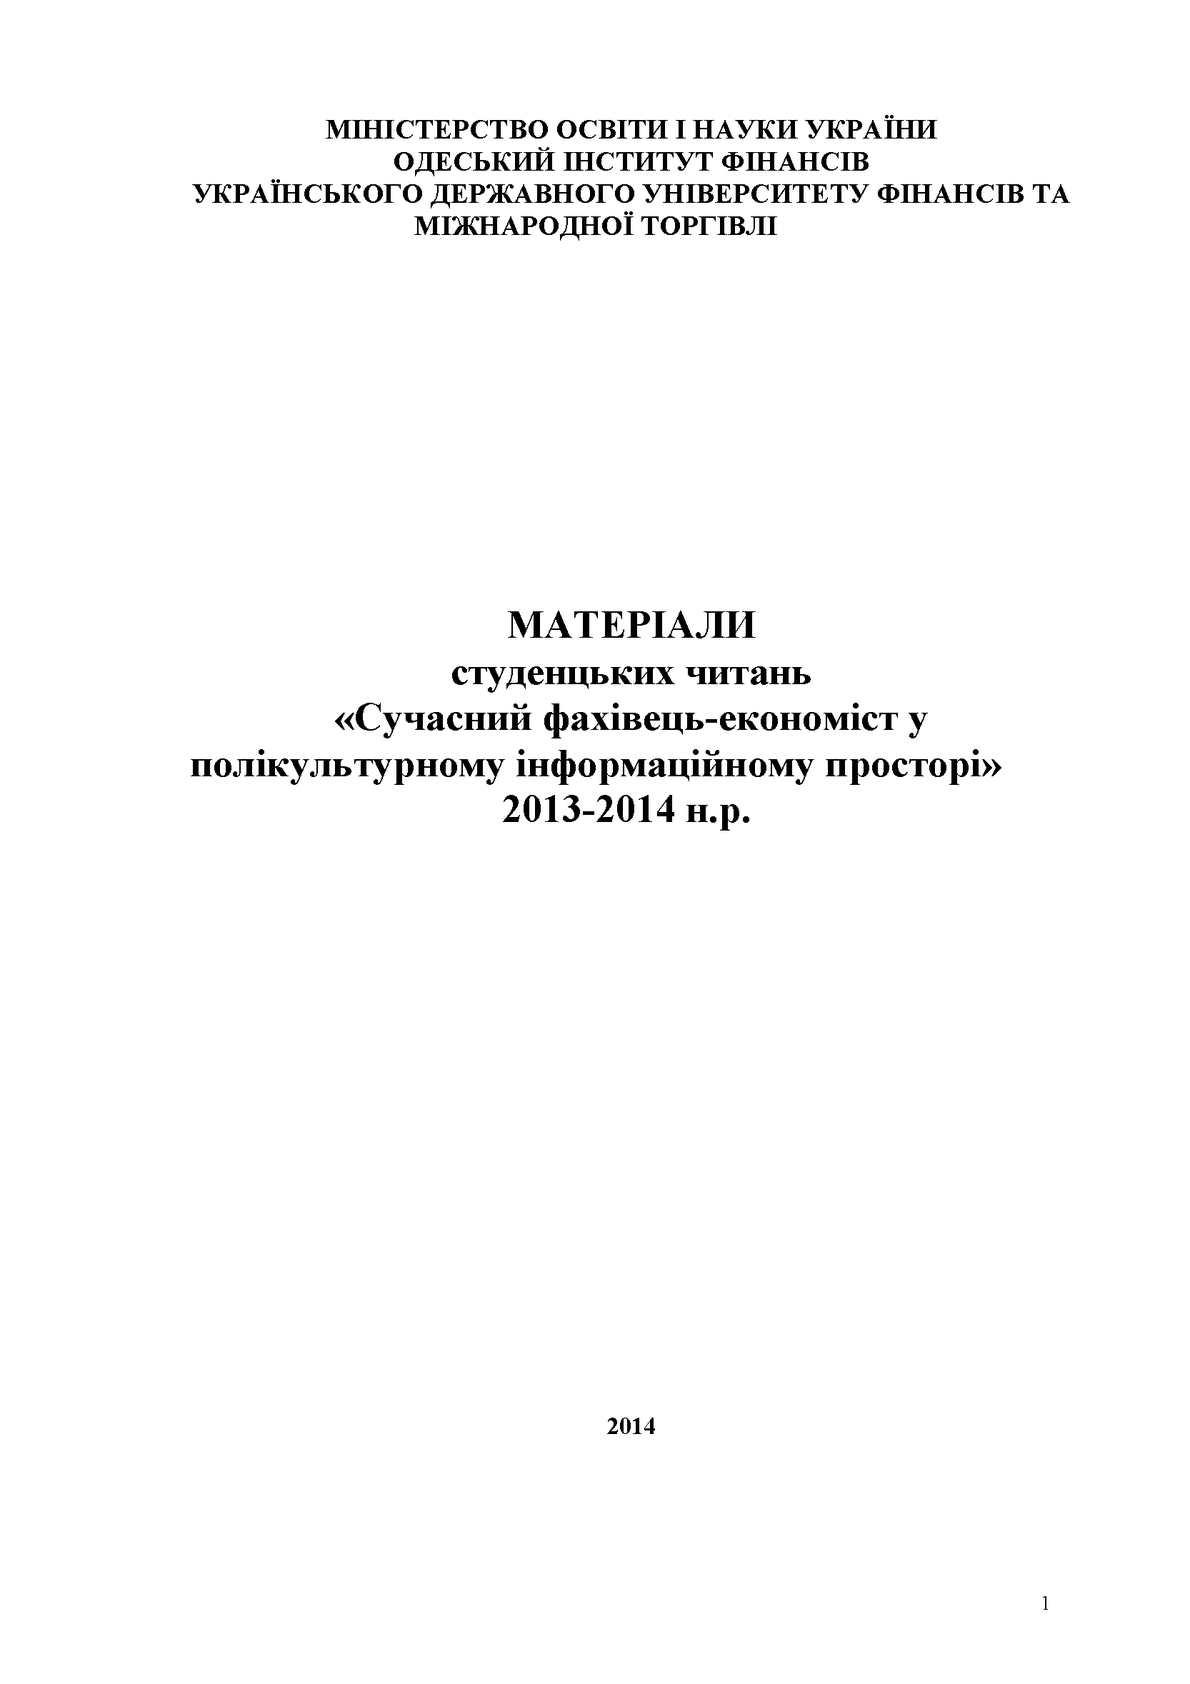 Calaméo - Materialy Stud Chitan fc5e6b4d8948c